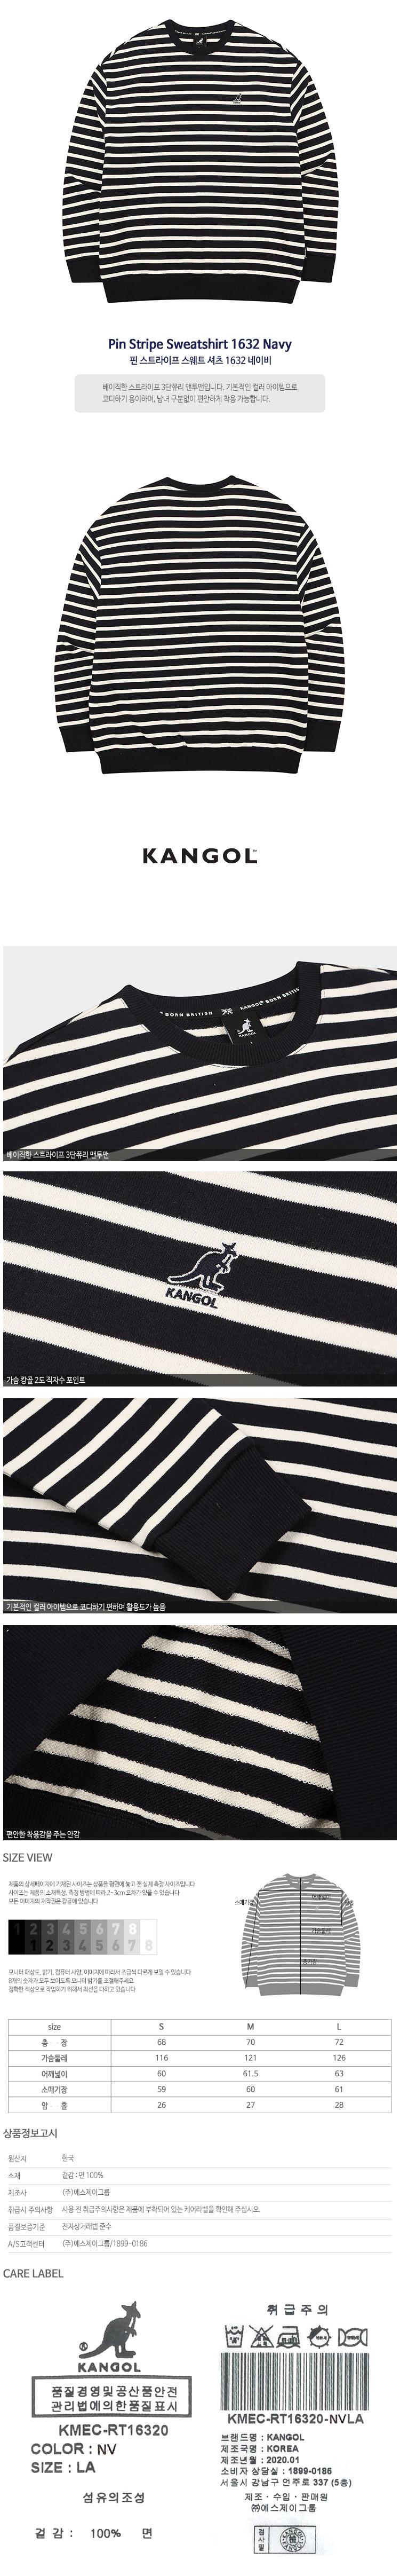 Pin Stripe Sweatshirt 1632 NAVY